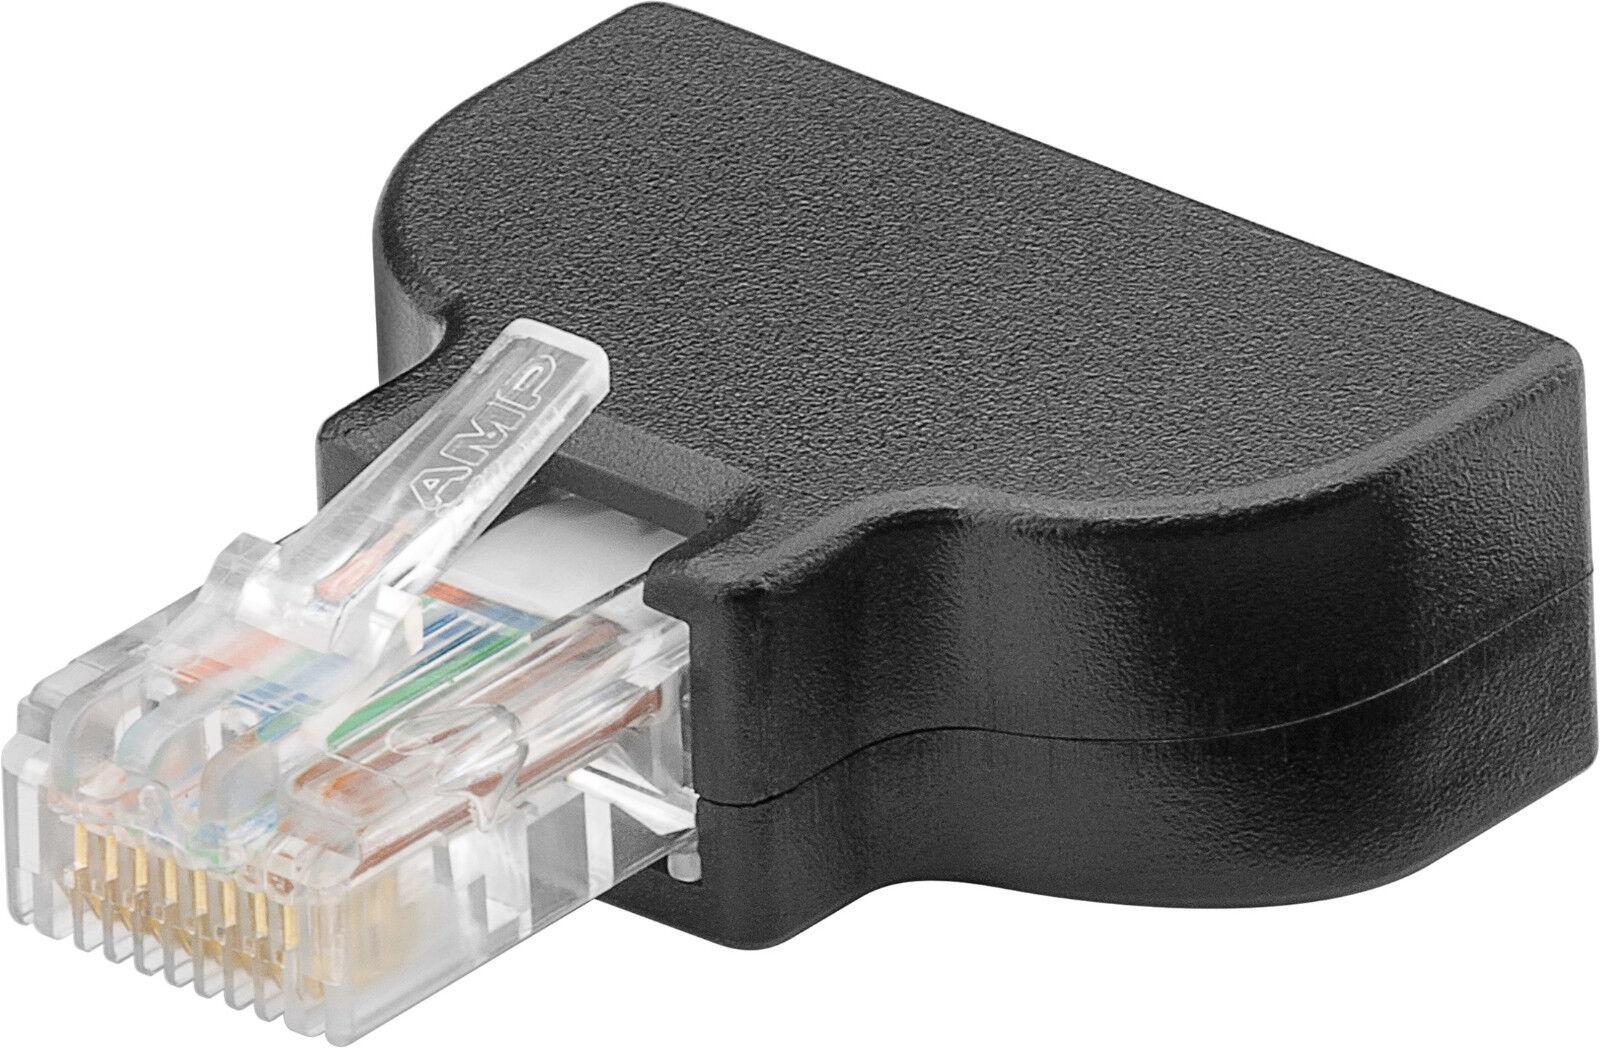 rj45 crimp stecker schraubversion rj 45 lan netzwerk verlegekabel starre litze ebay. Black Bedroom Furniture Sets. Home Design Ideas